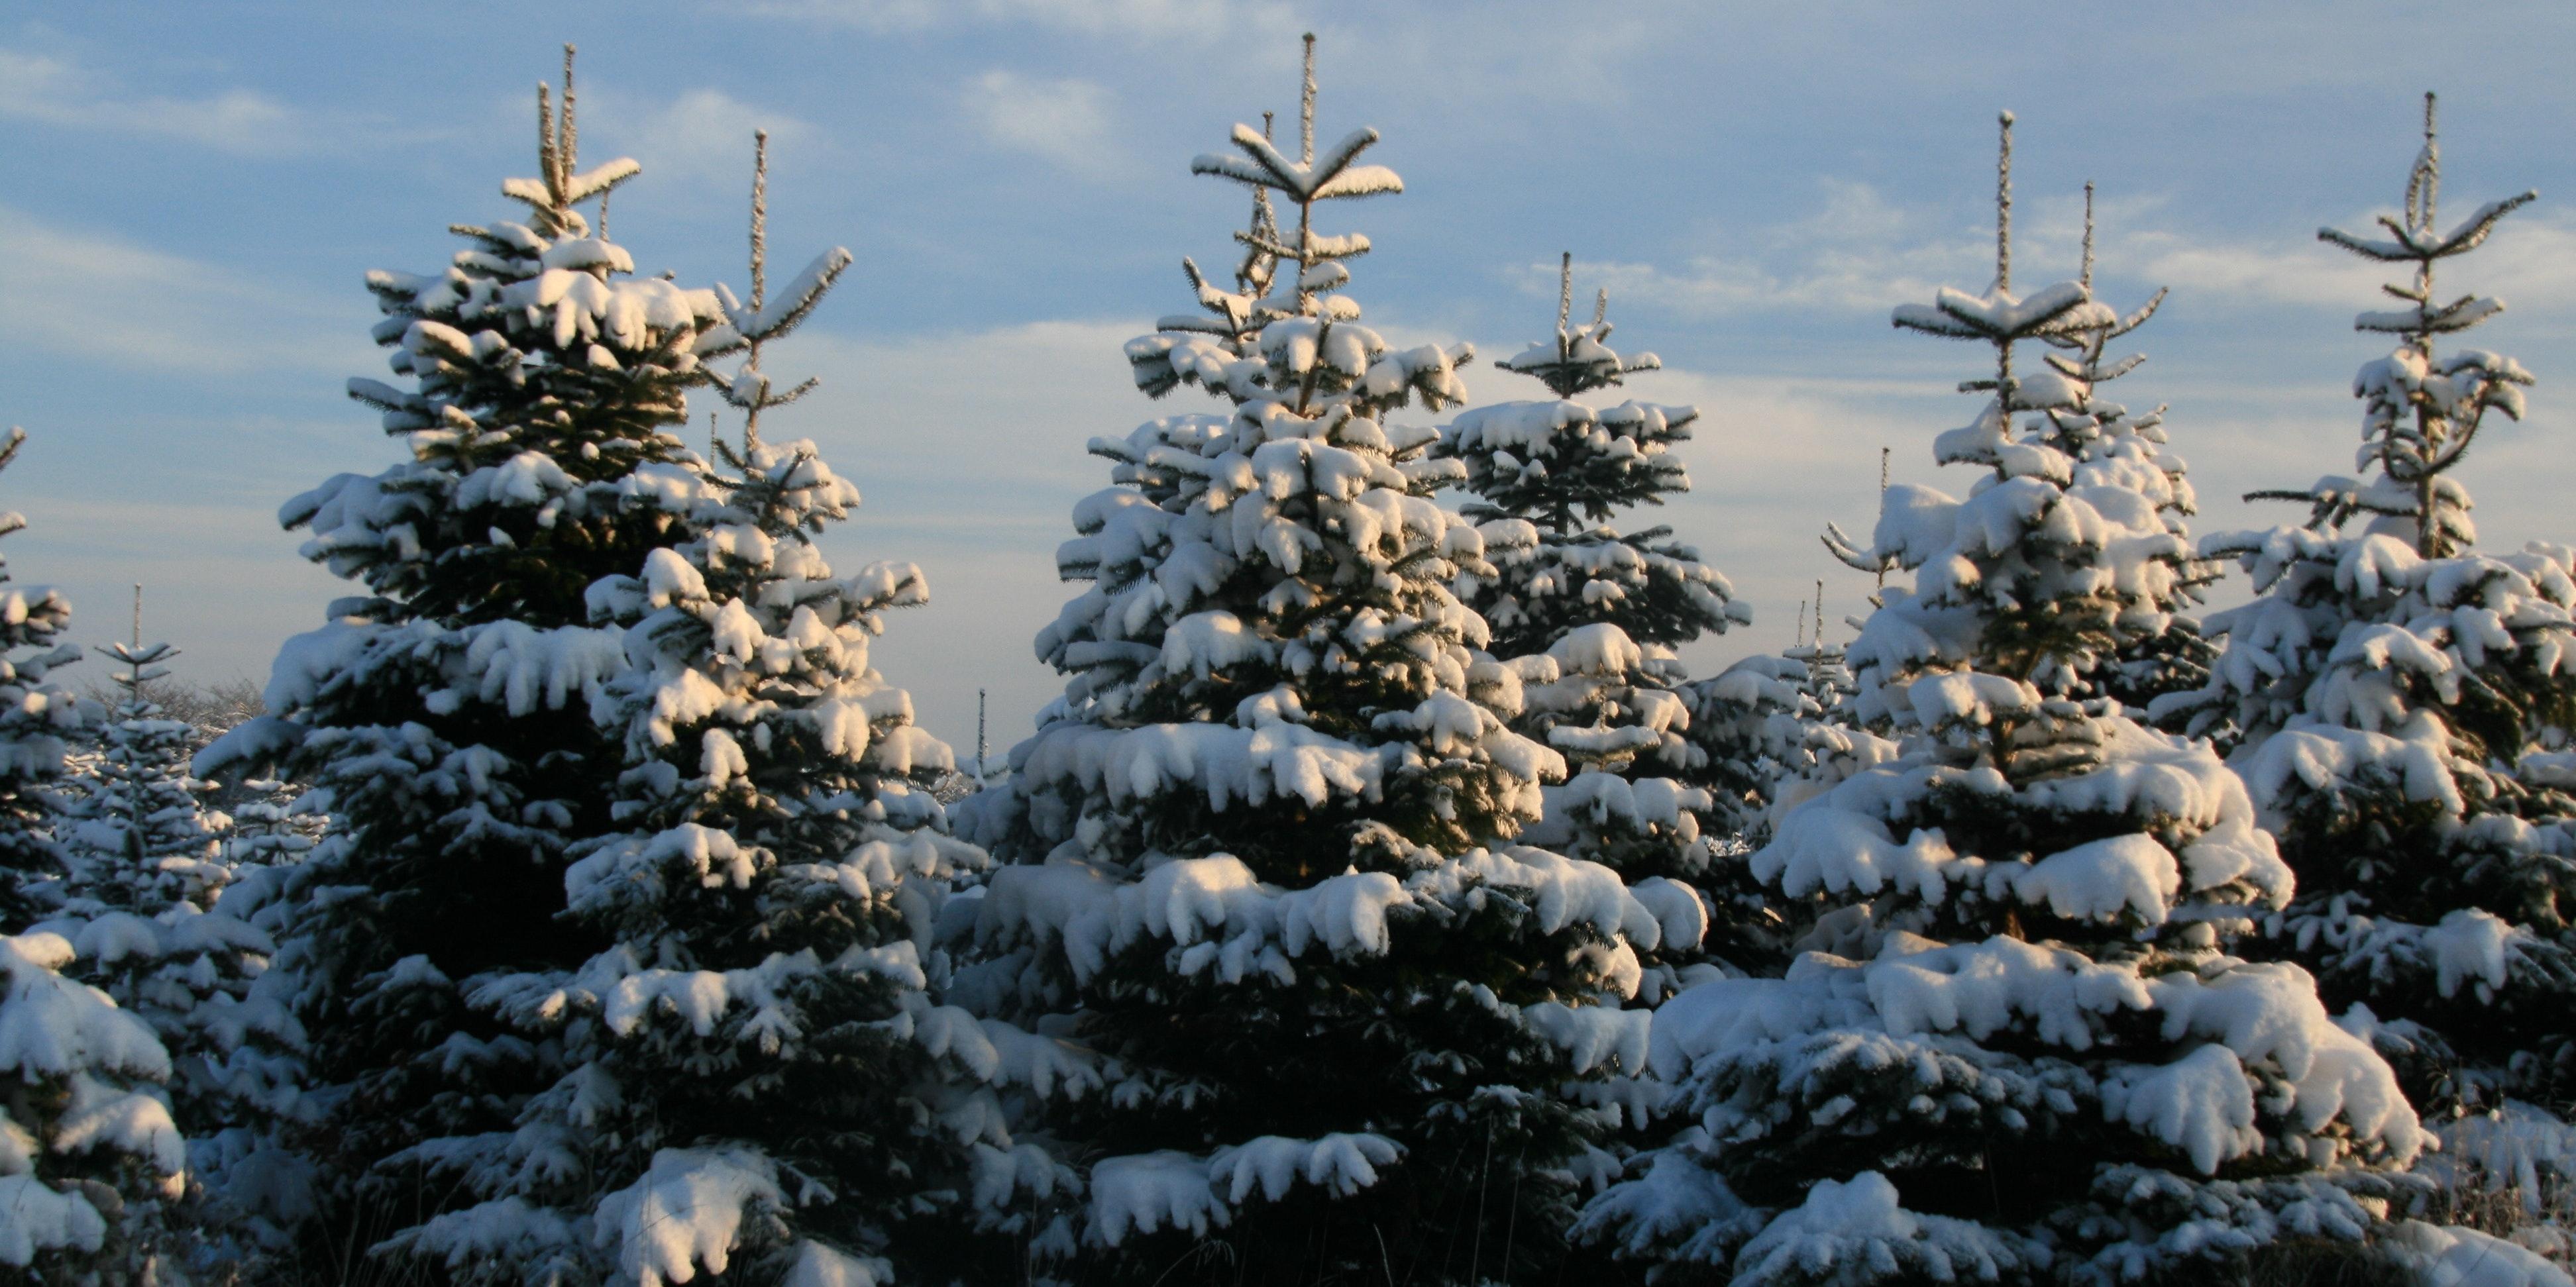 Next year's crop (Christmas tree farm) #2